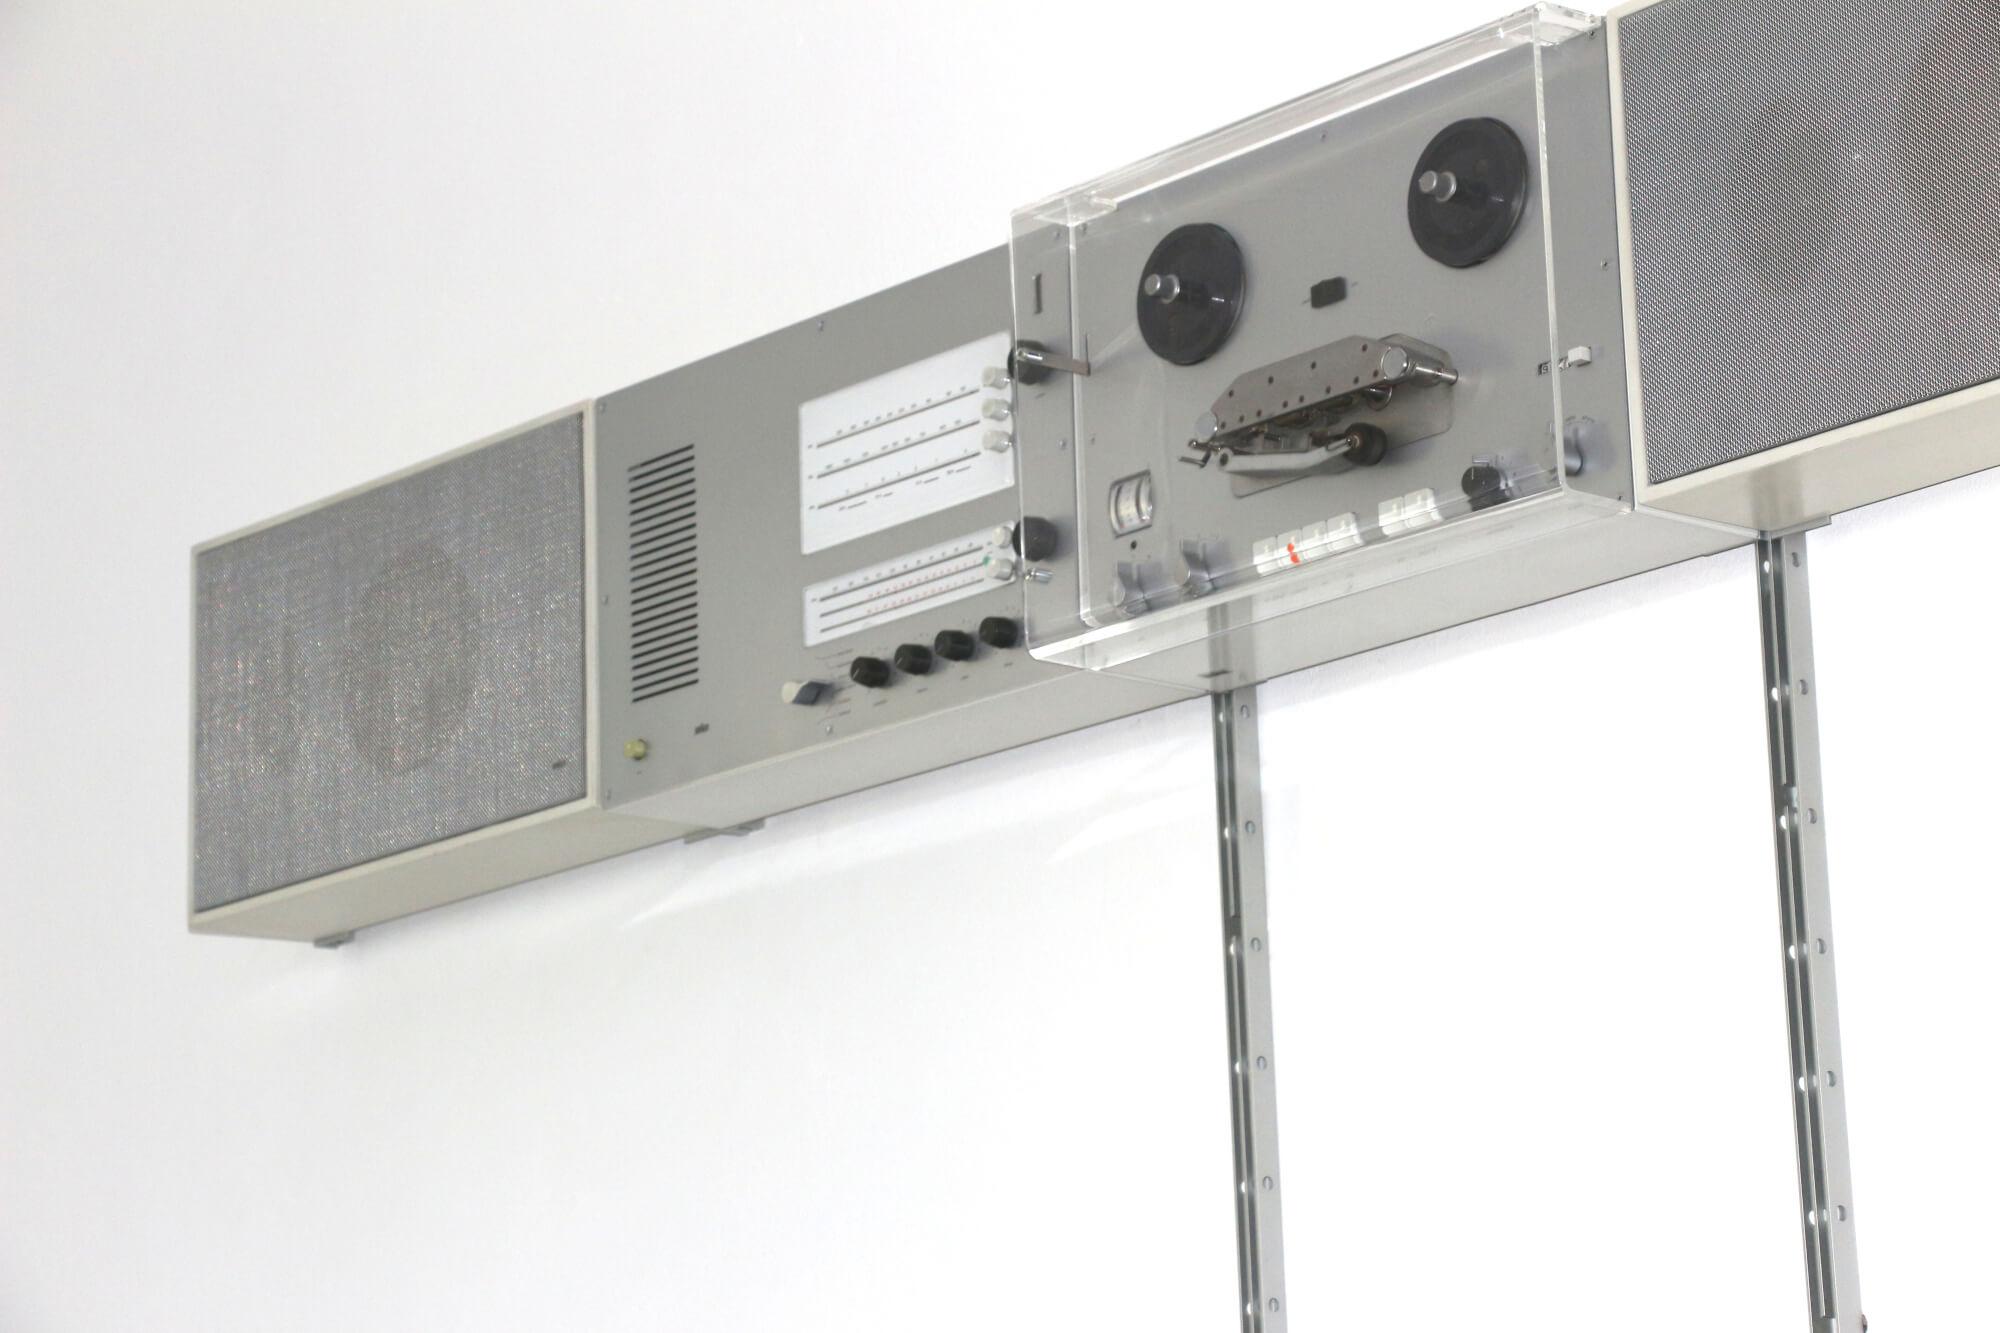 braun wandanlage wall unit 1965 Dieter Rams